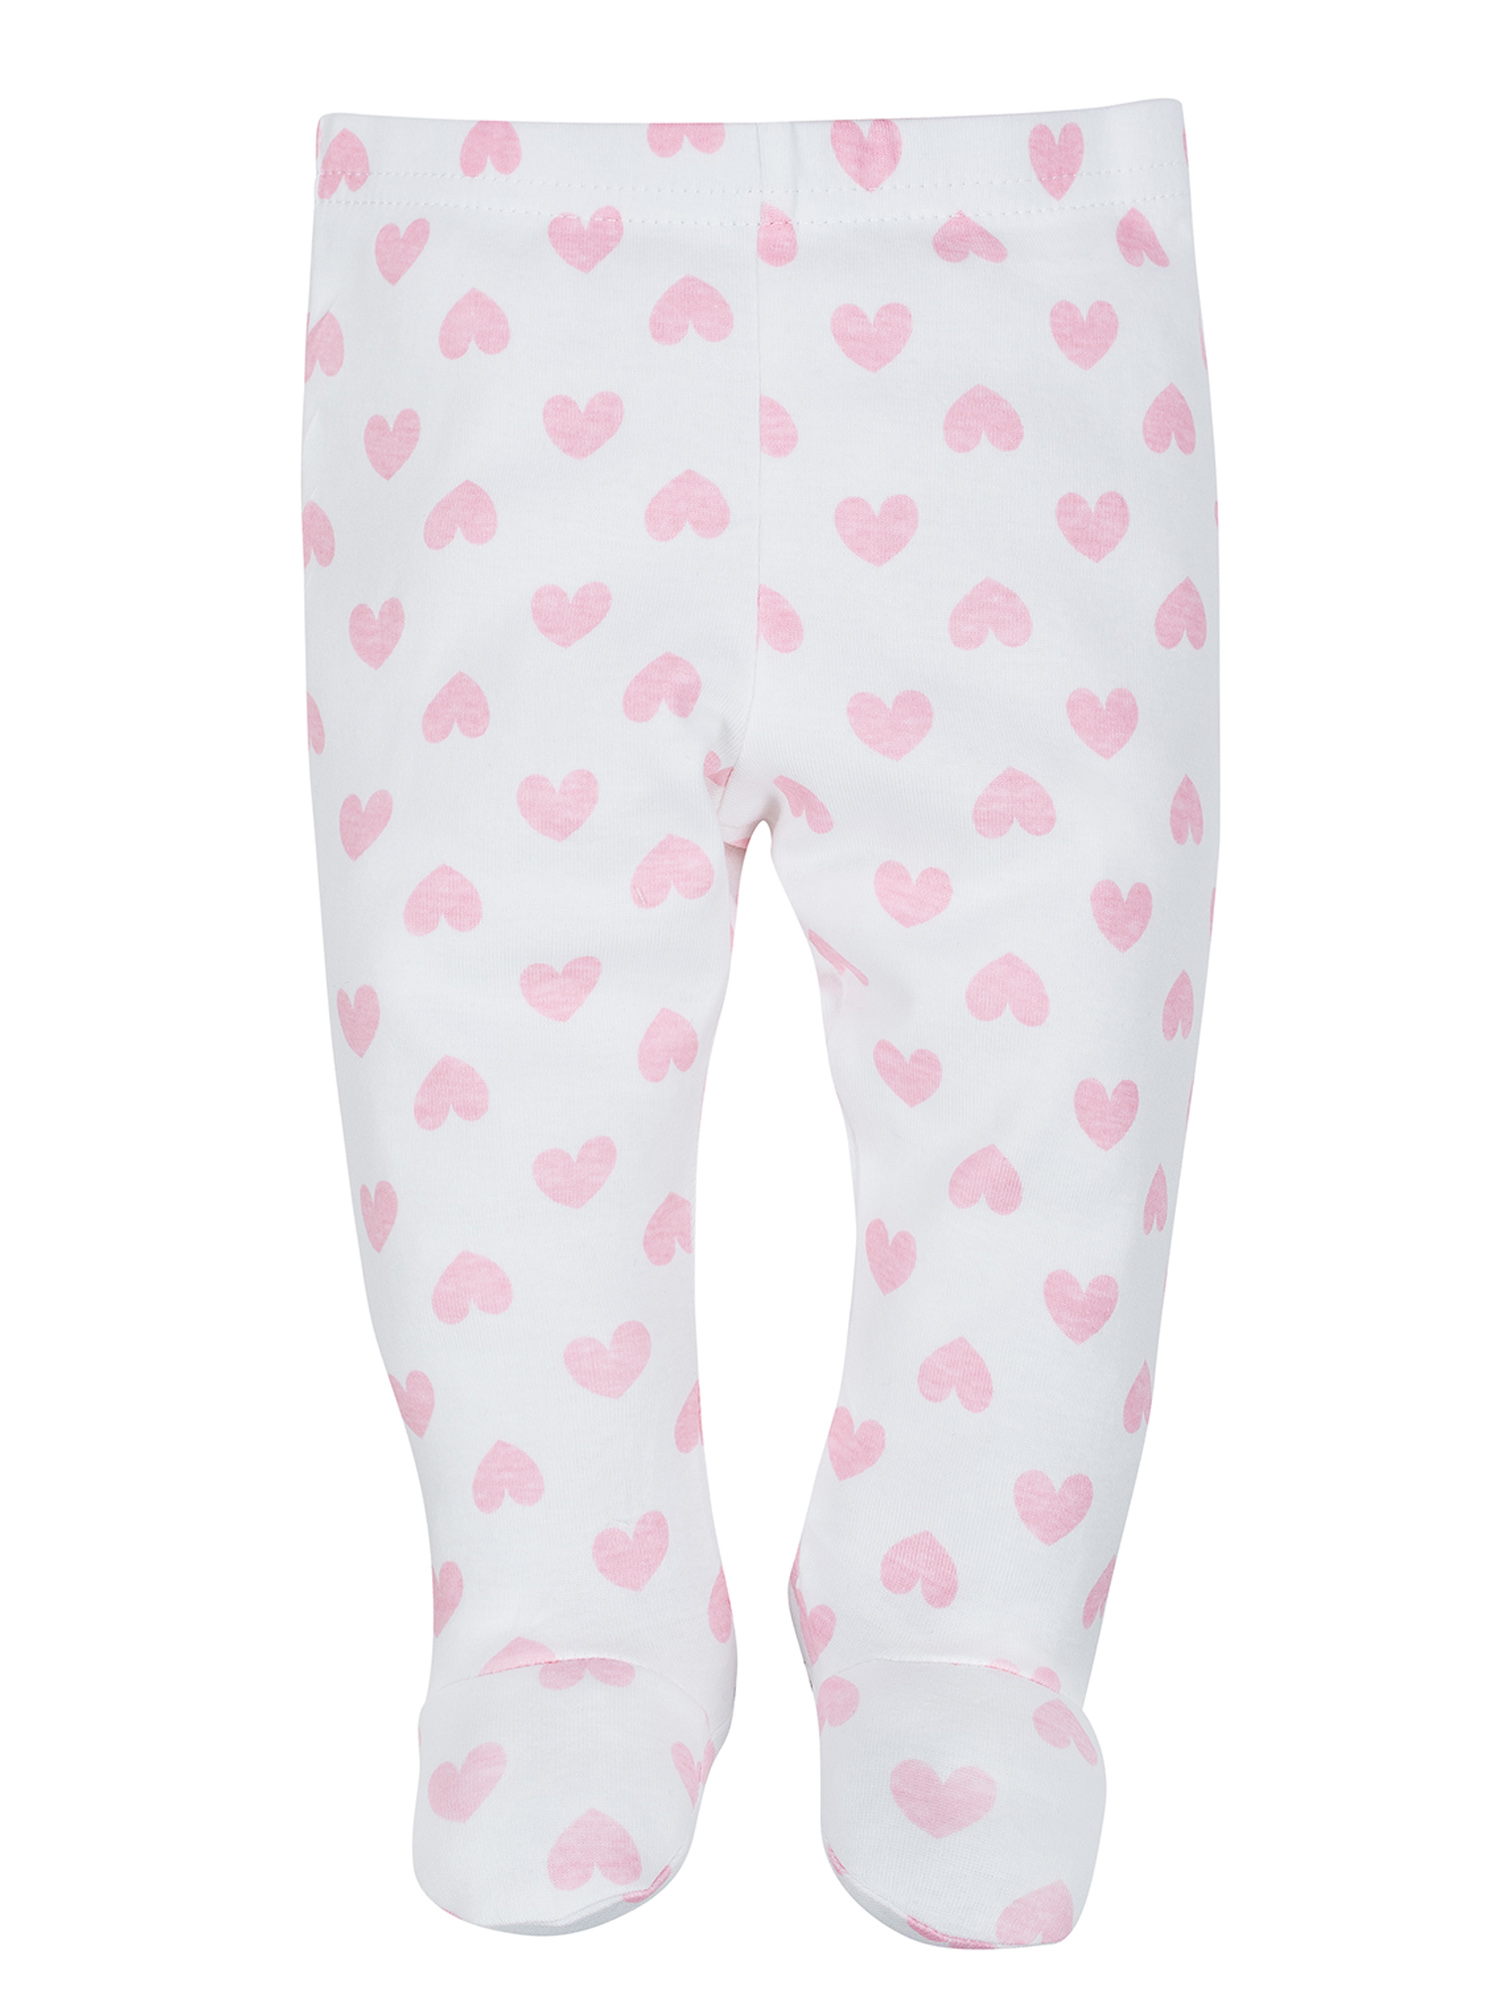 Baby Girls GERBER Organic Cotton Pink Take-Me-Home Set Cute Elephant 3-Piece